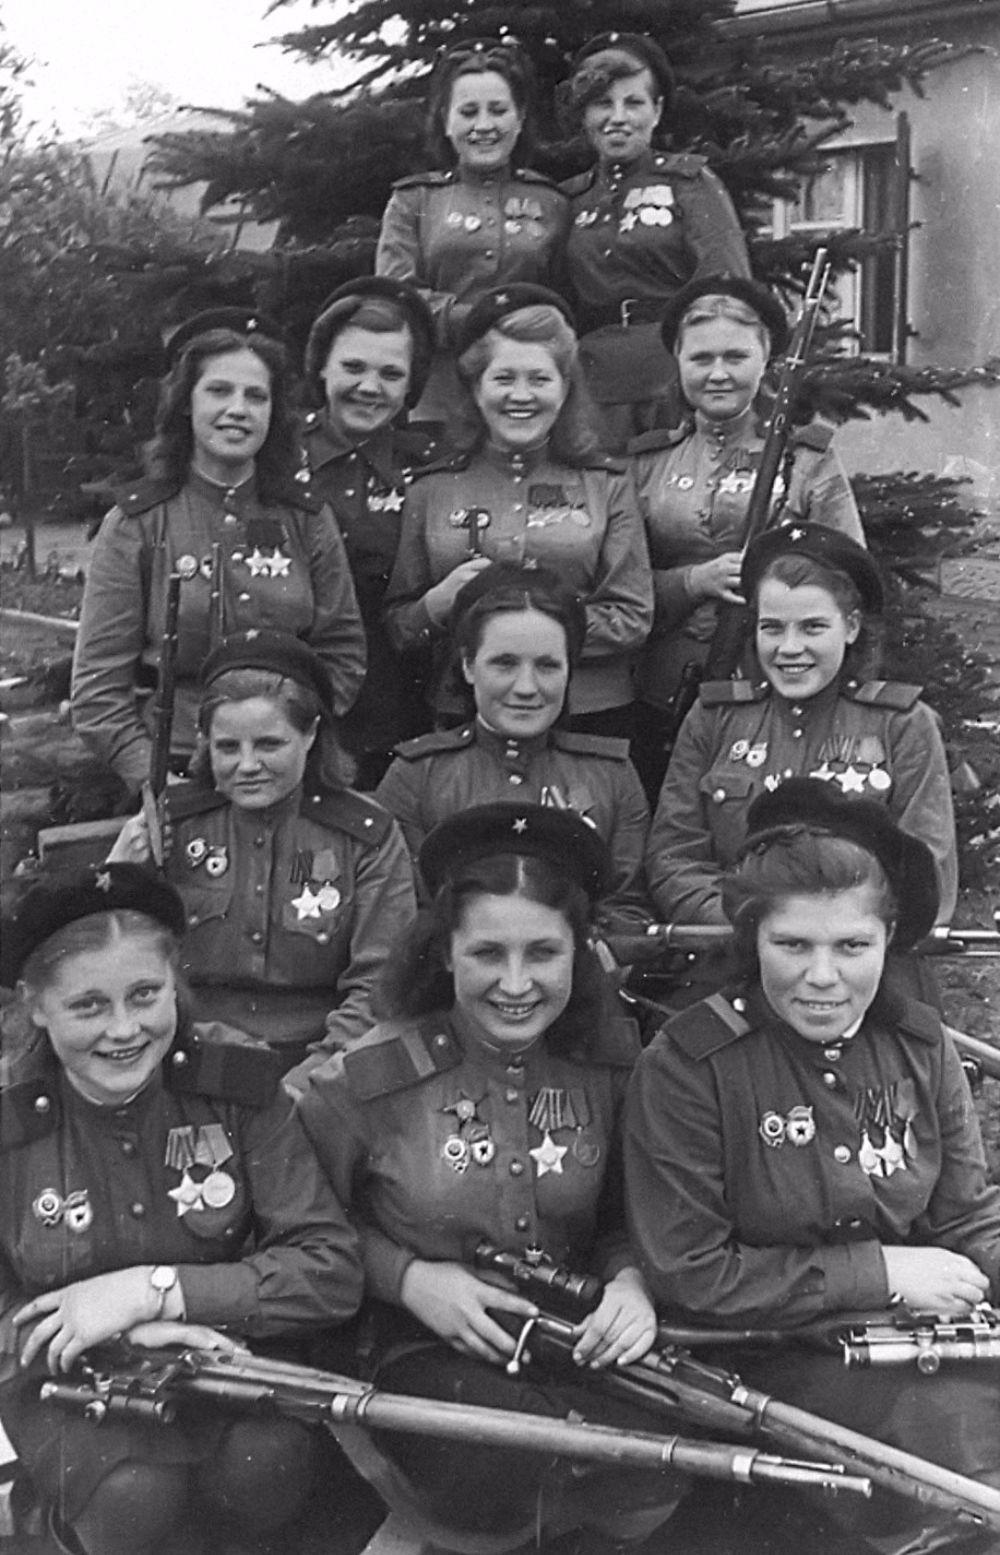 Collectibles Russian & Soviet Program Precise Old Ful Set 39 Postcard Soviet Space Astronauts Heroes Rocket Gagarin Tereshkova